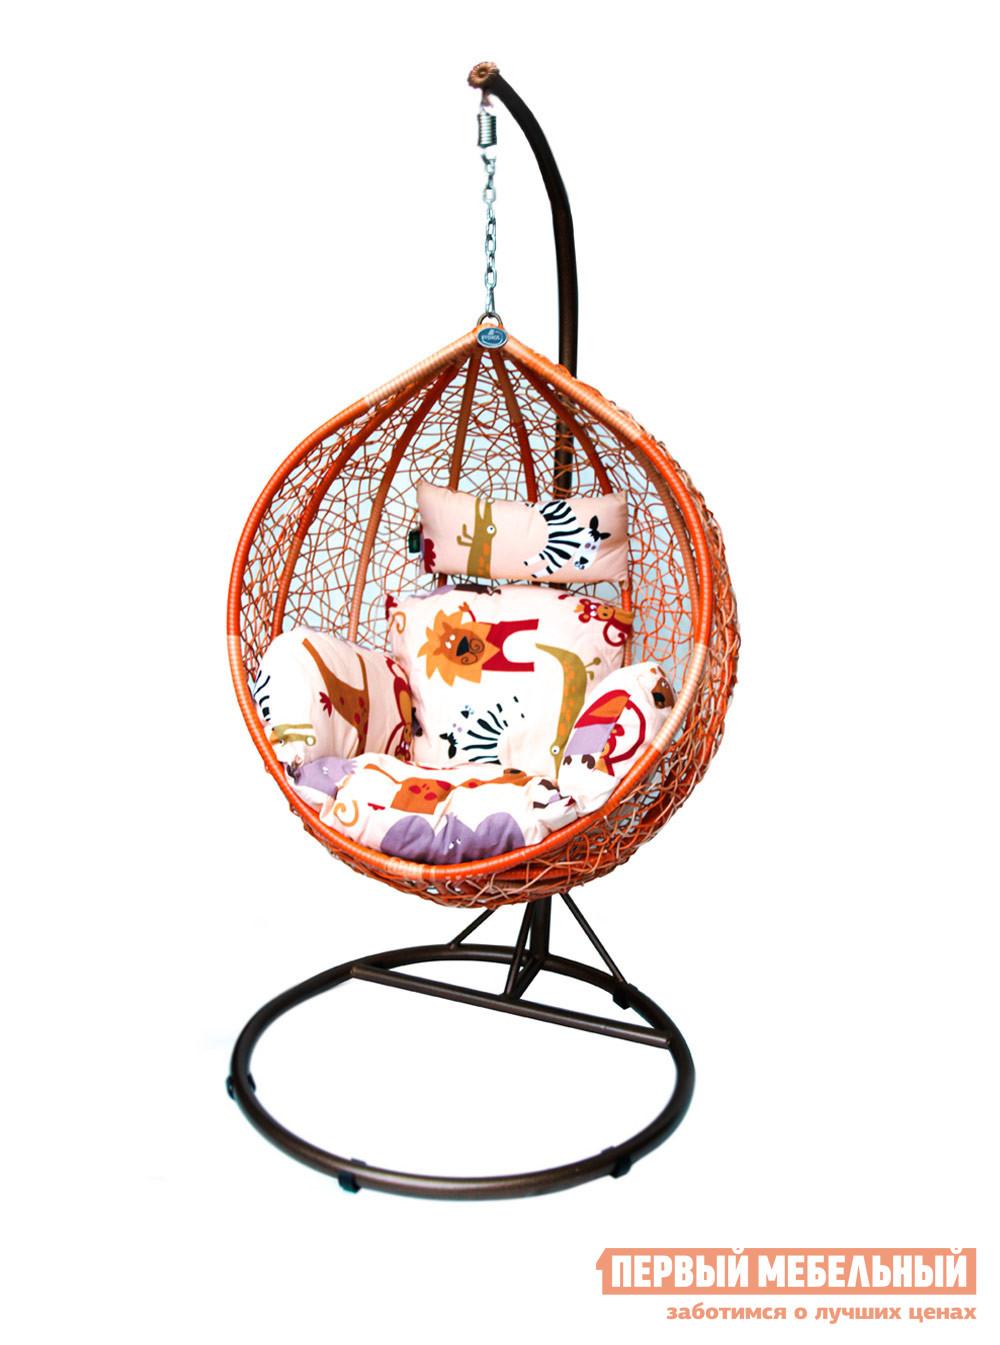 Подвесное кресло Kvimol KM-0001 (рыжий, подушка со зверушками) Рыжий иск. ротанг / Подушка со зверушками